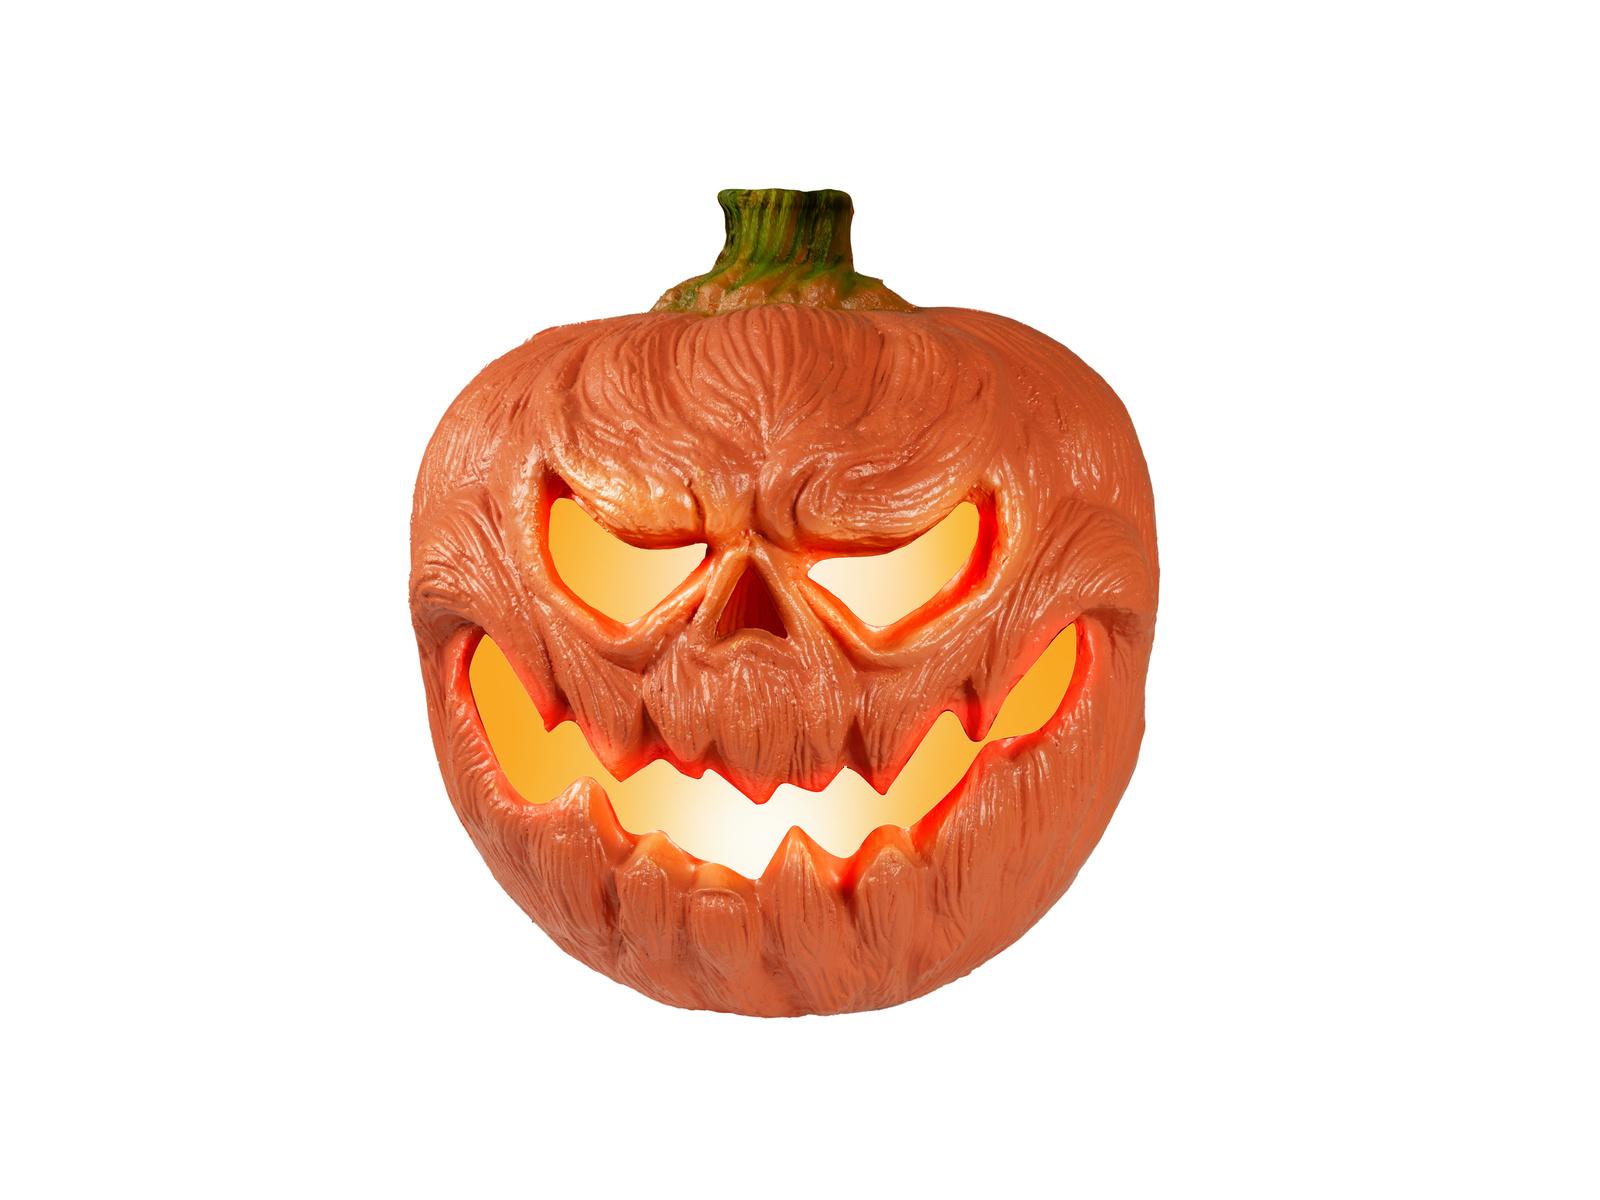 EUROPALMS EUROPALMS Halloween Pumpkin illuminated, 18cm